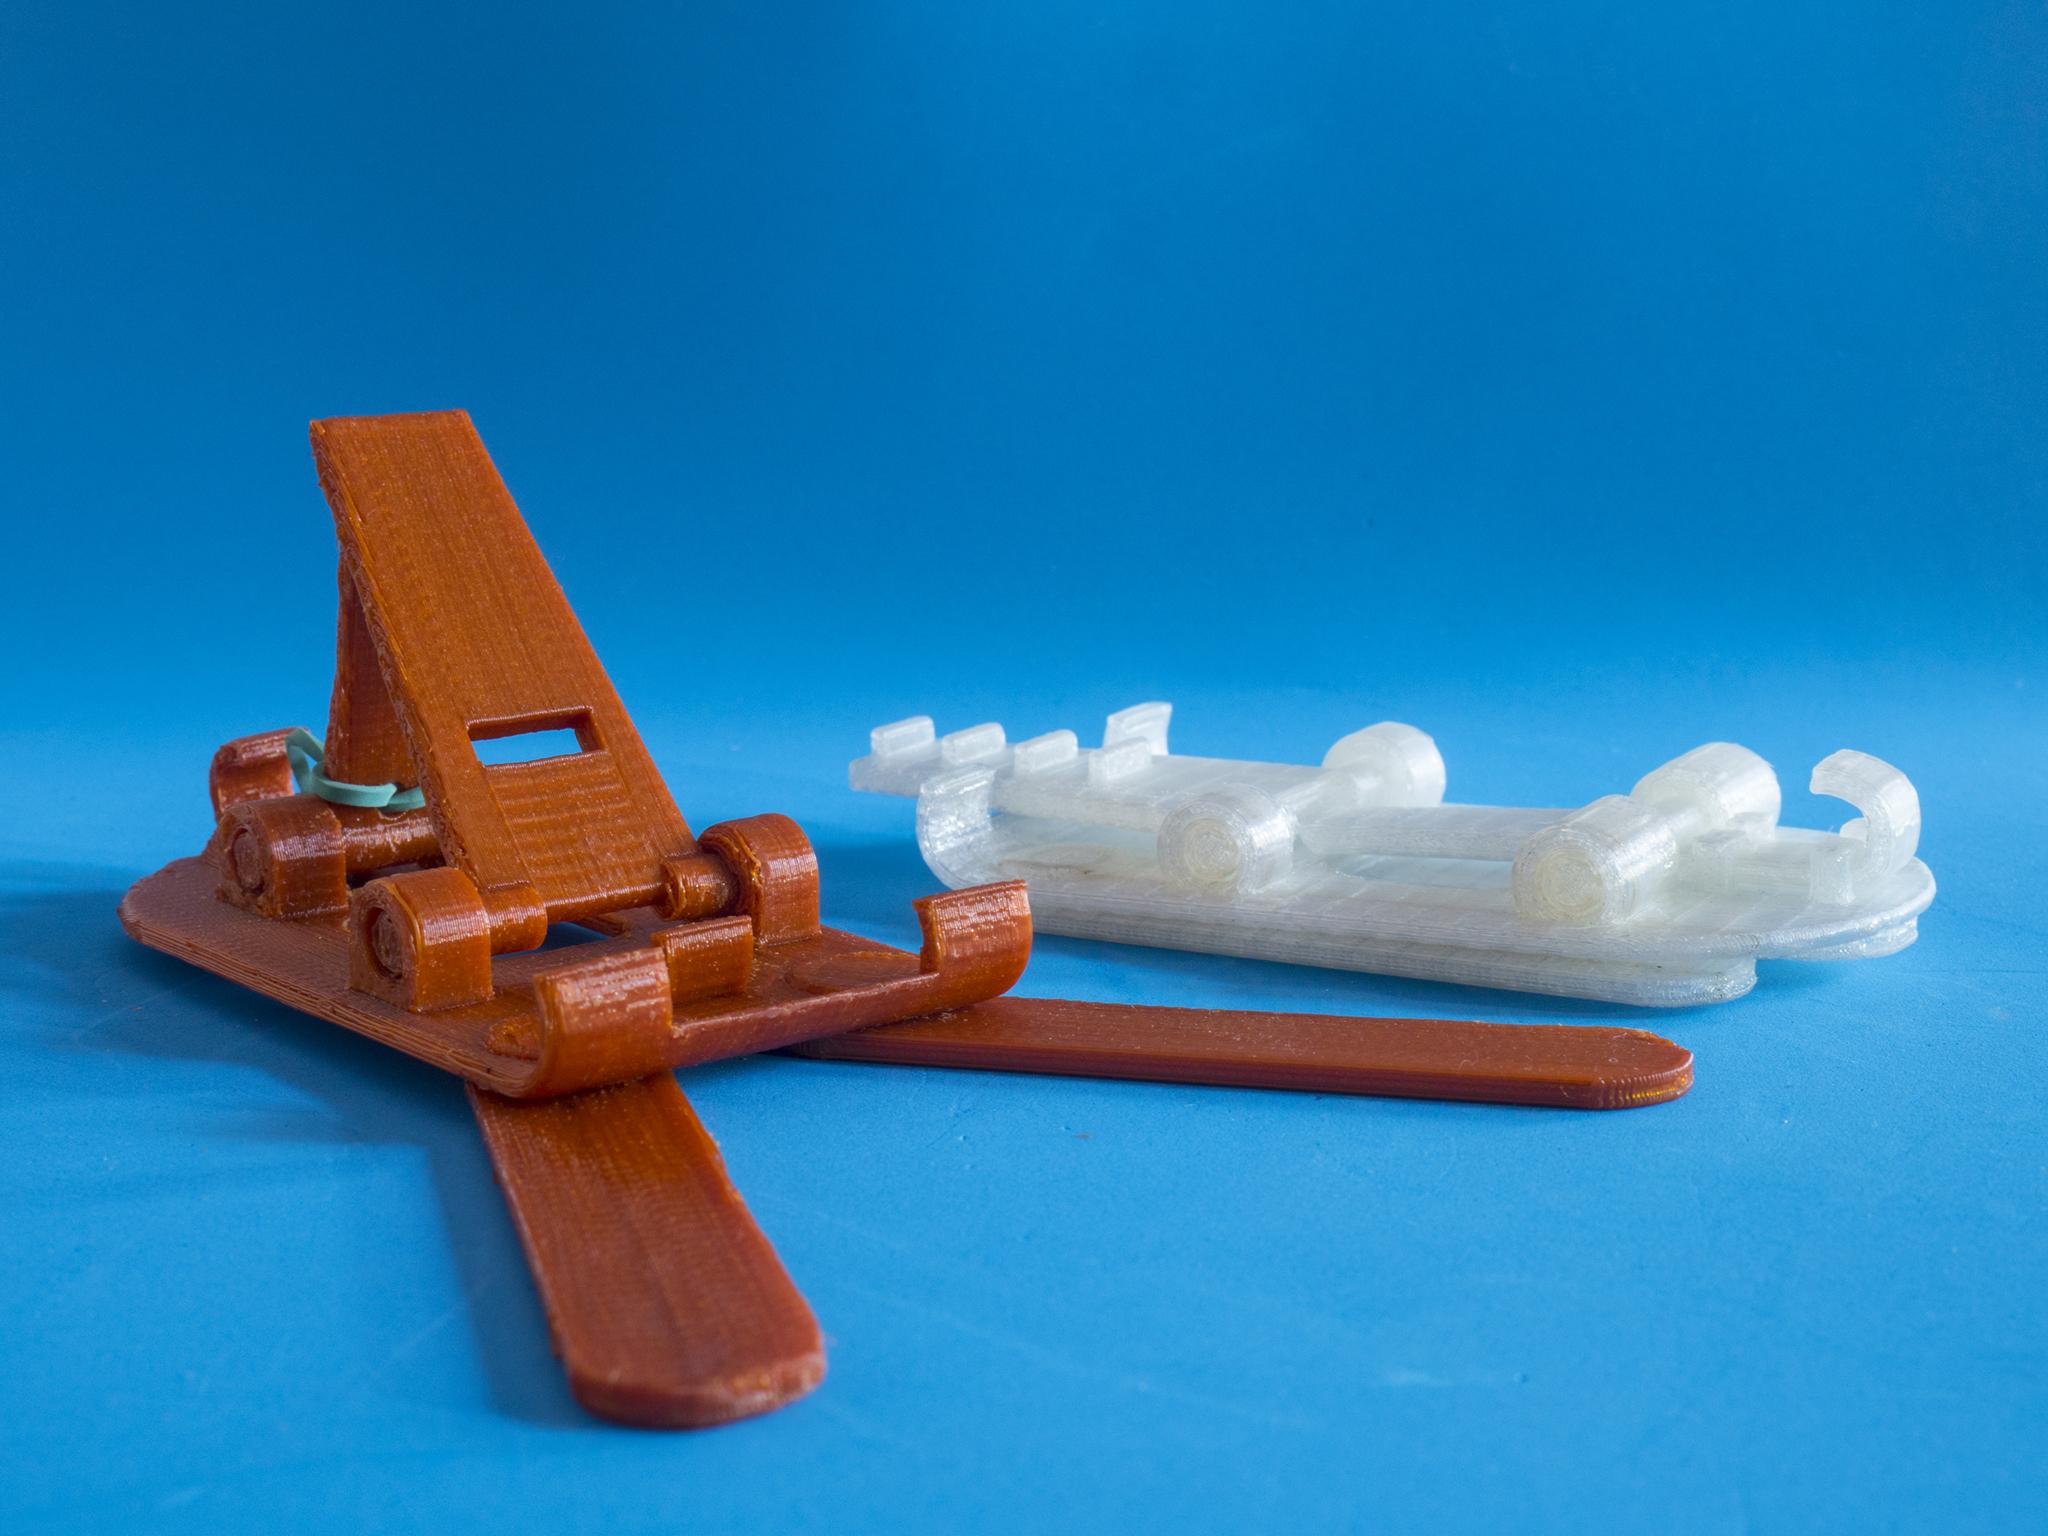 F11.jpg Download free STL file Adjustable Belly Tablet Stand • 3D printable template, dancingchicken